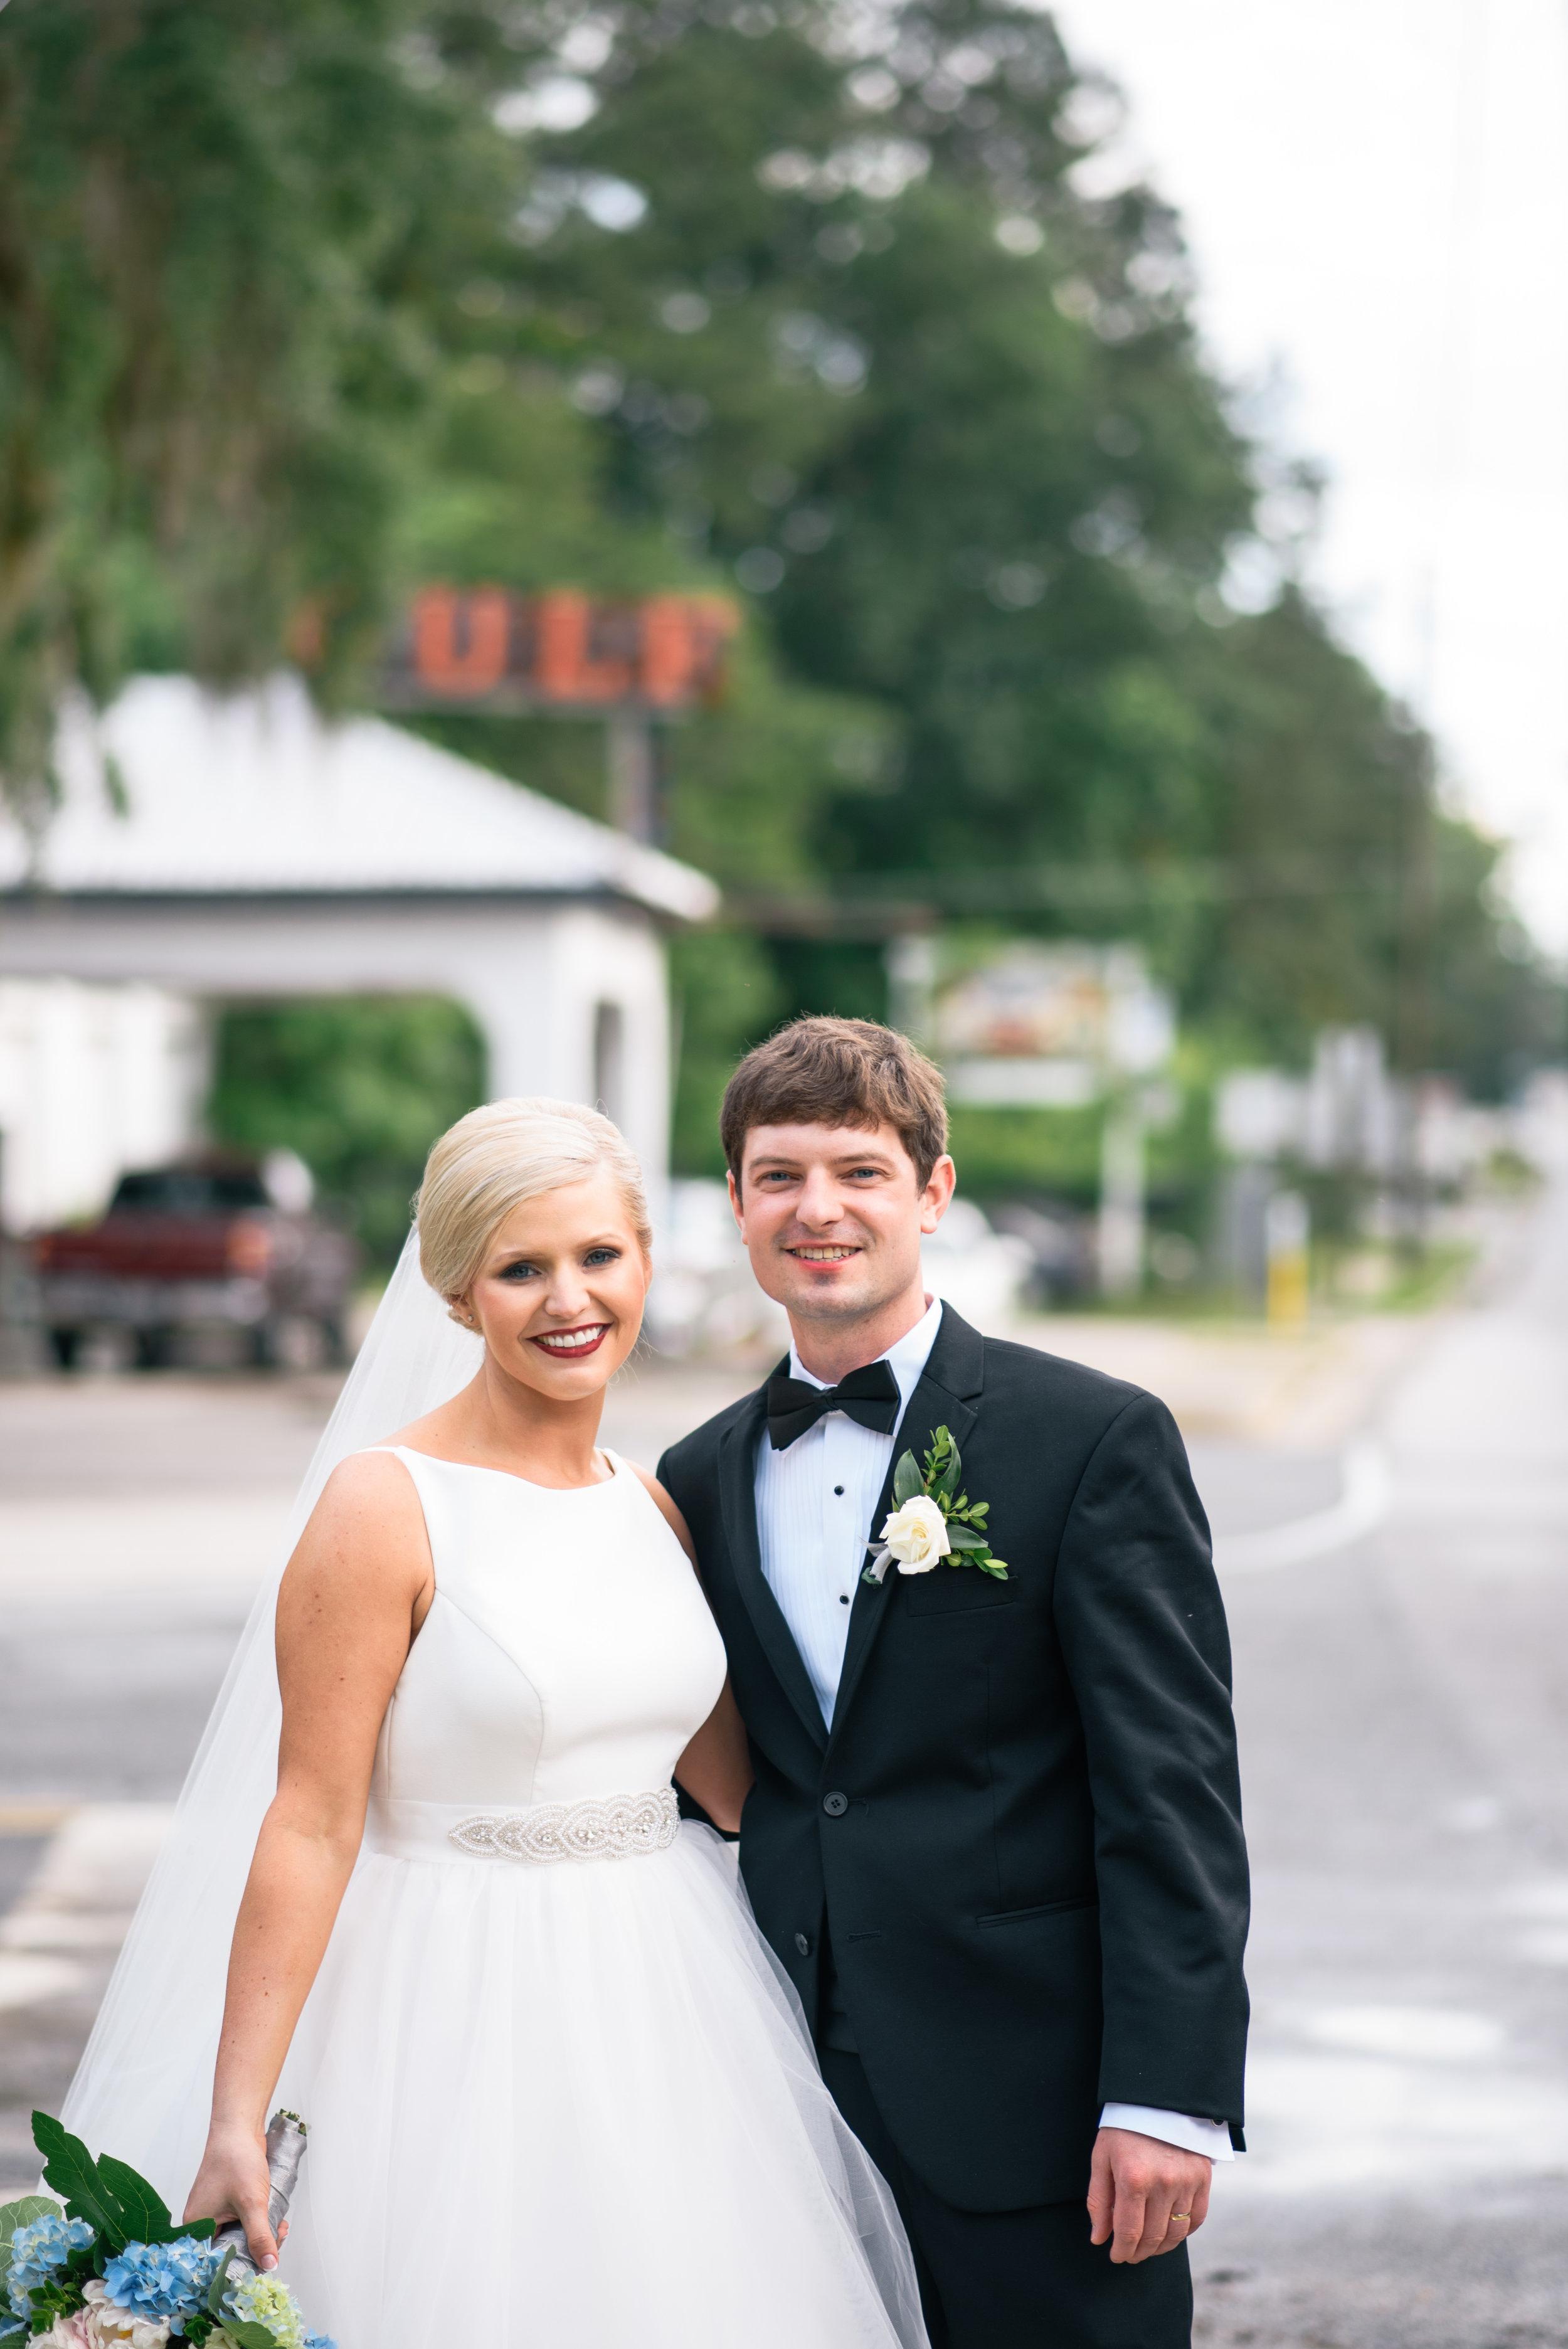 ali-and-jared-savannah-georgia-may-2017-wedding-meg-hill-photo-(503of760).jpg